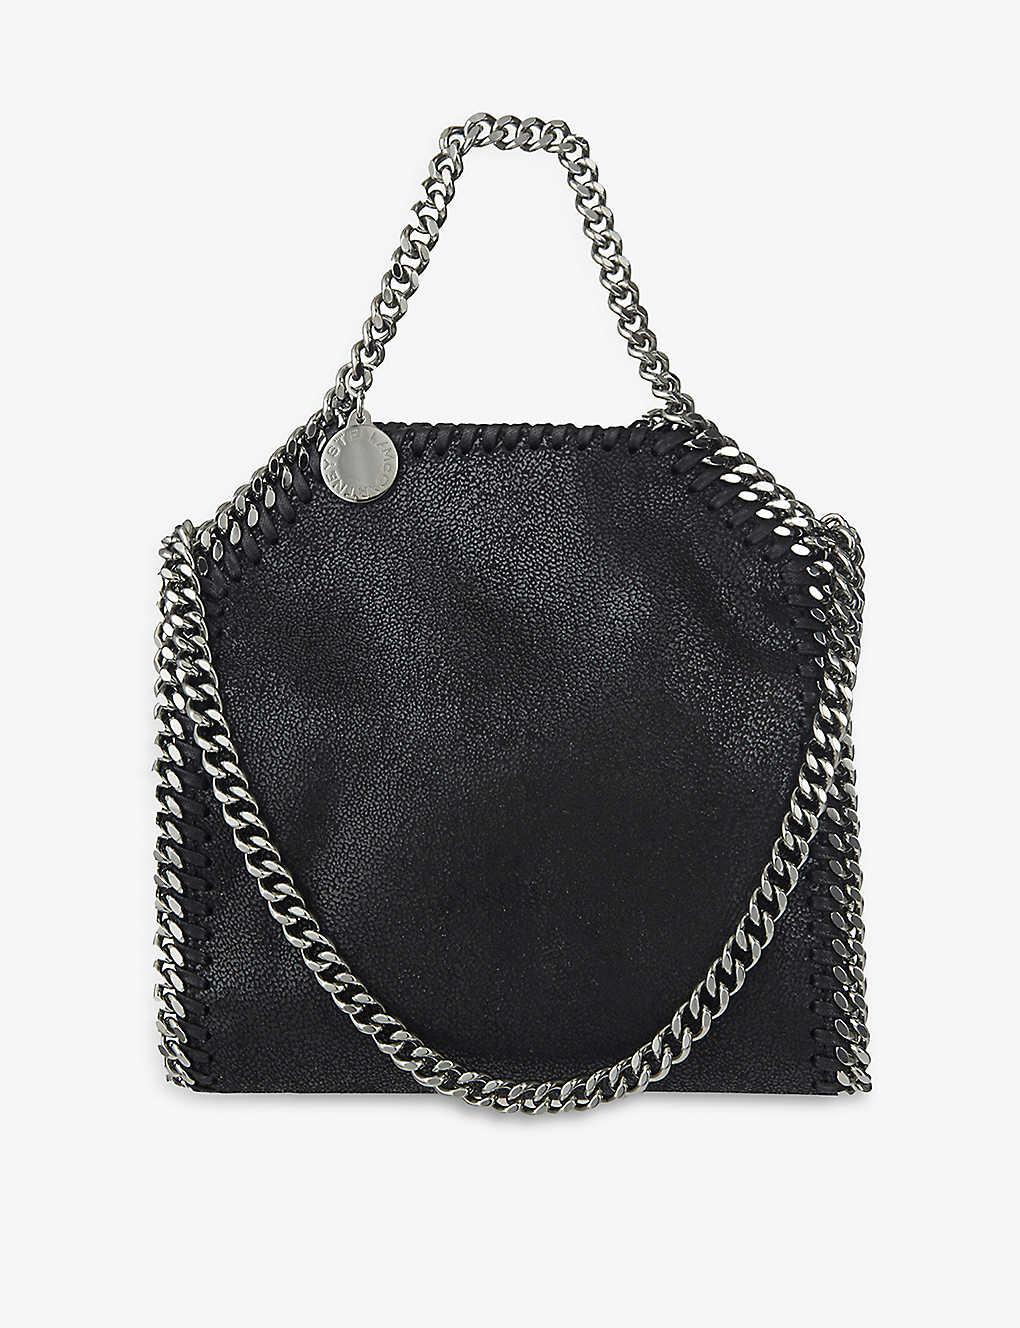 b66591451e56 STELLA MCCARTNEY - Tiny Falabella shoulder bag   Selfridges.com